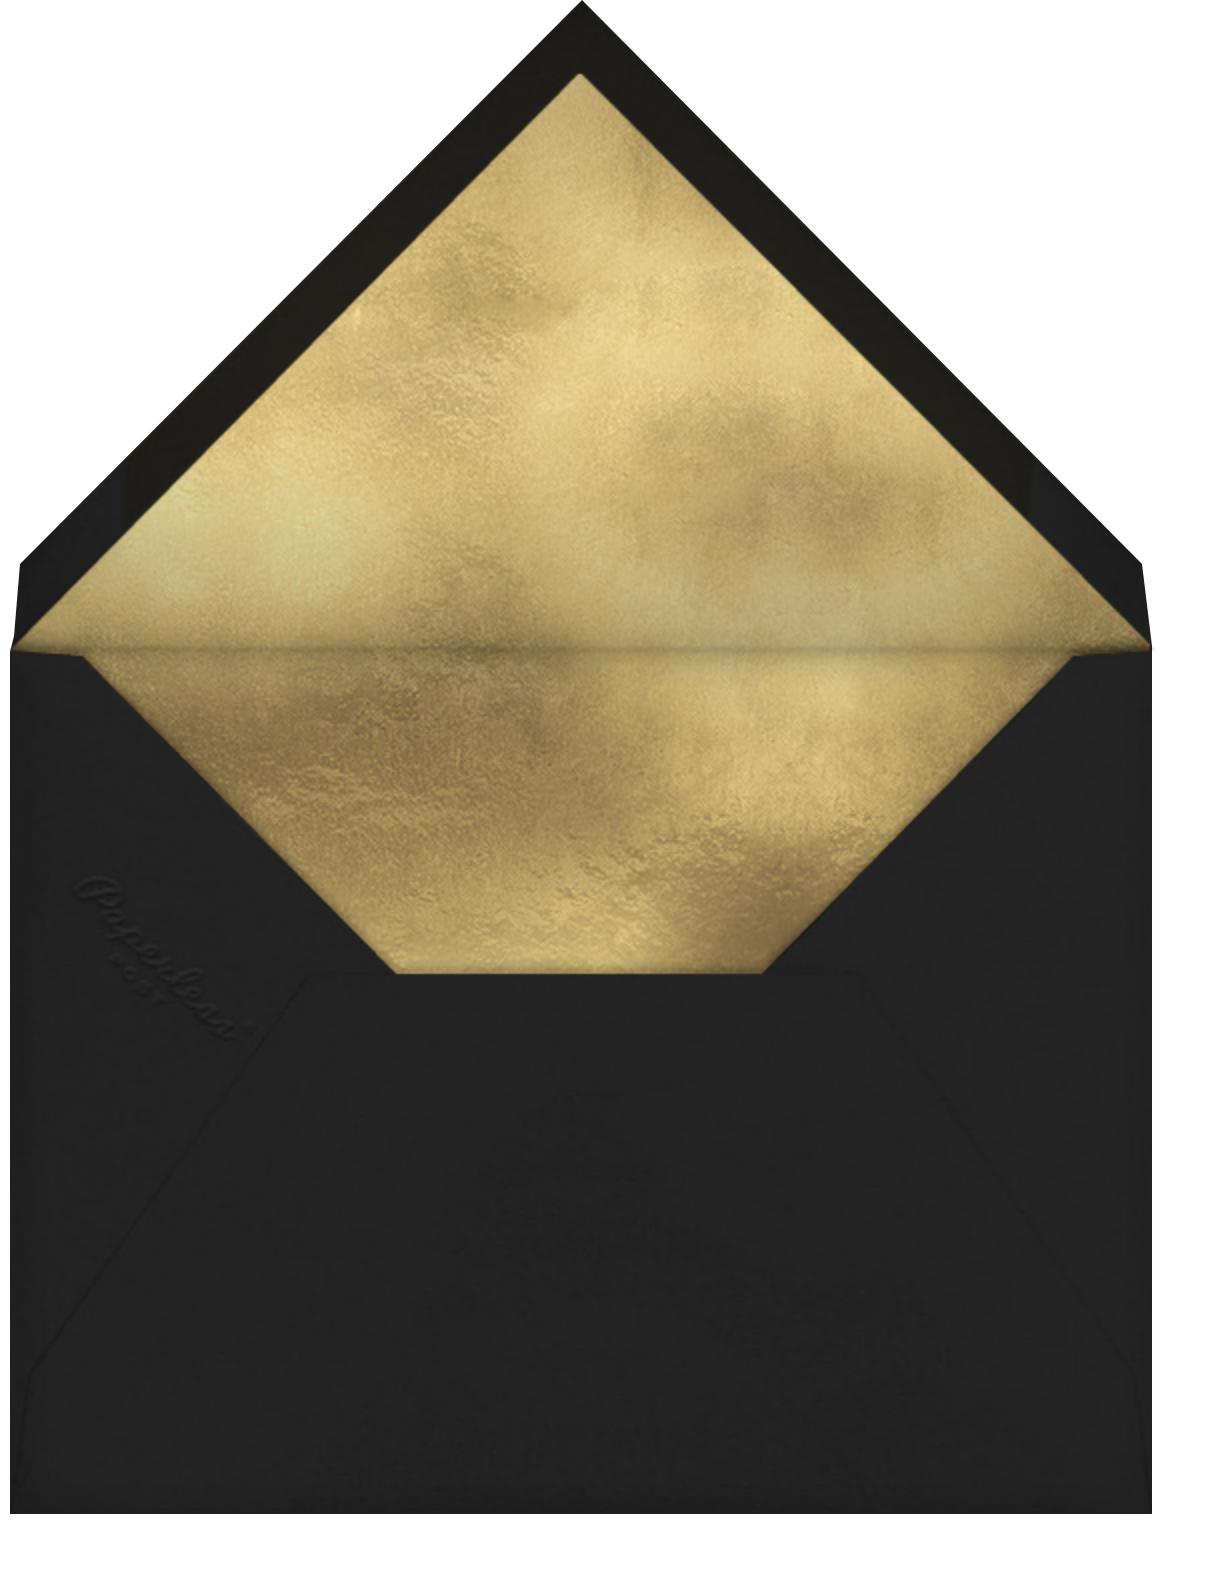 Fizzy - Meringue - Mr. Boddington's Studio - Save the date - envelope back